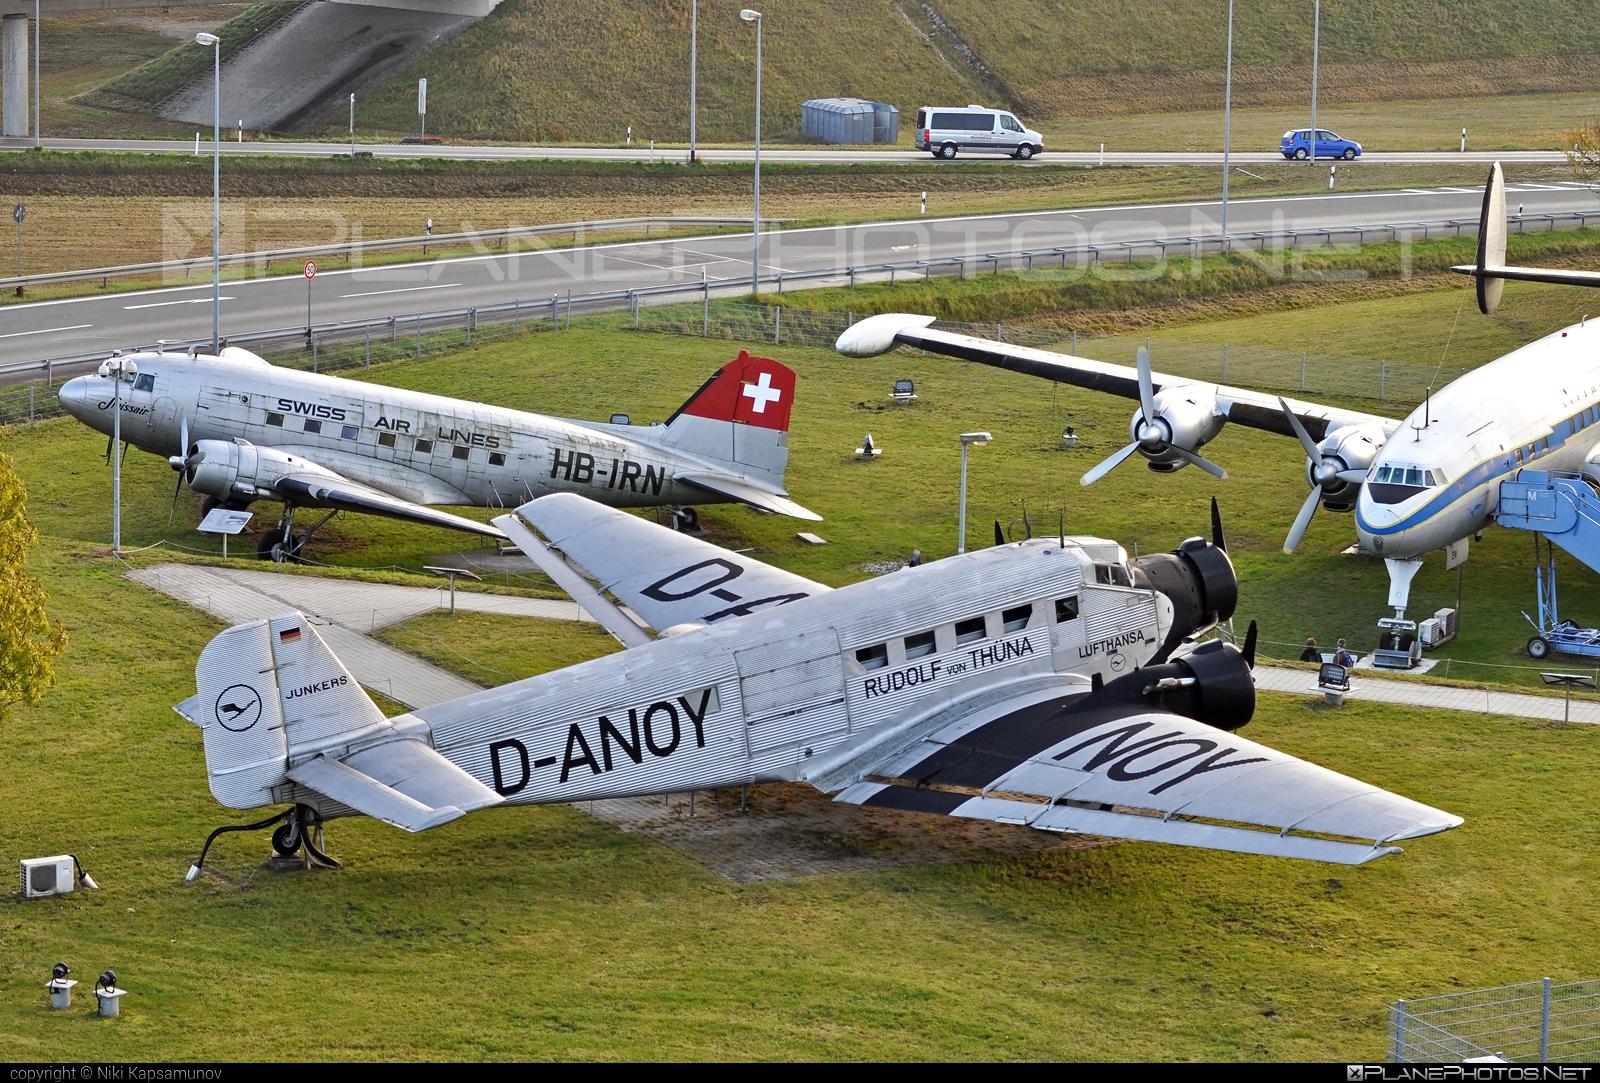 CASA 352L - D-ANOY operated by Lufthansa #casa #casa352 #casa352l #ju52 #junkers52 #junkersju52 #lufthansa